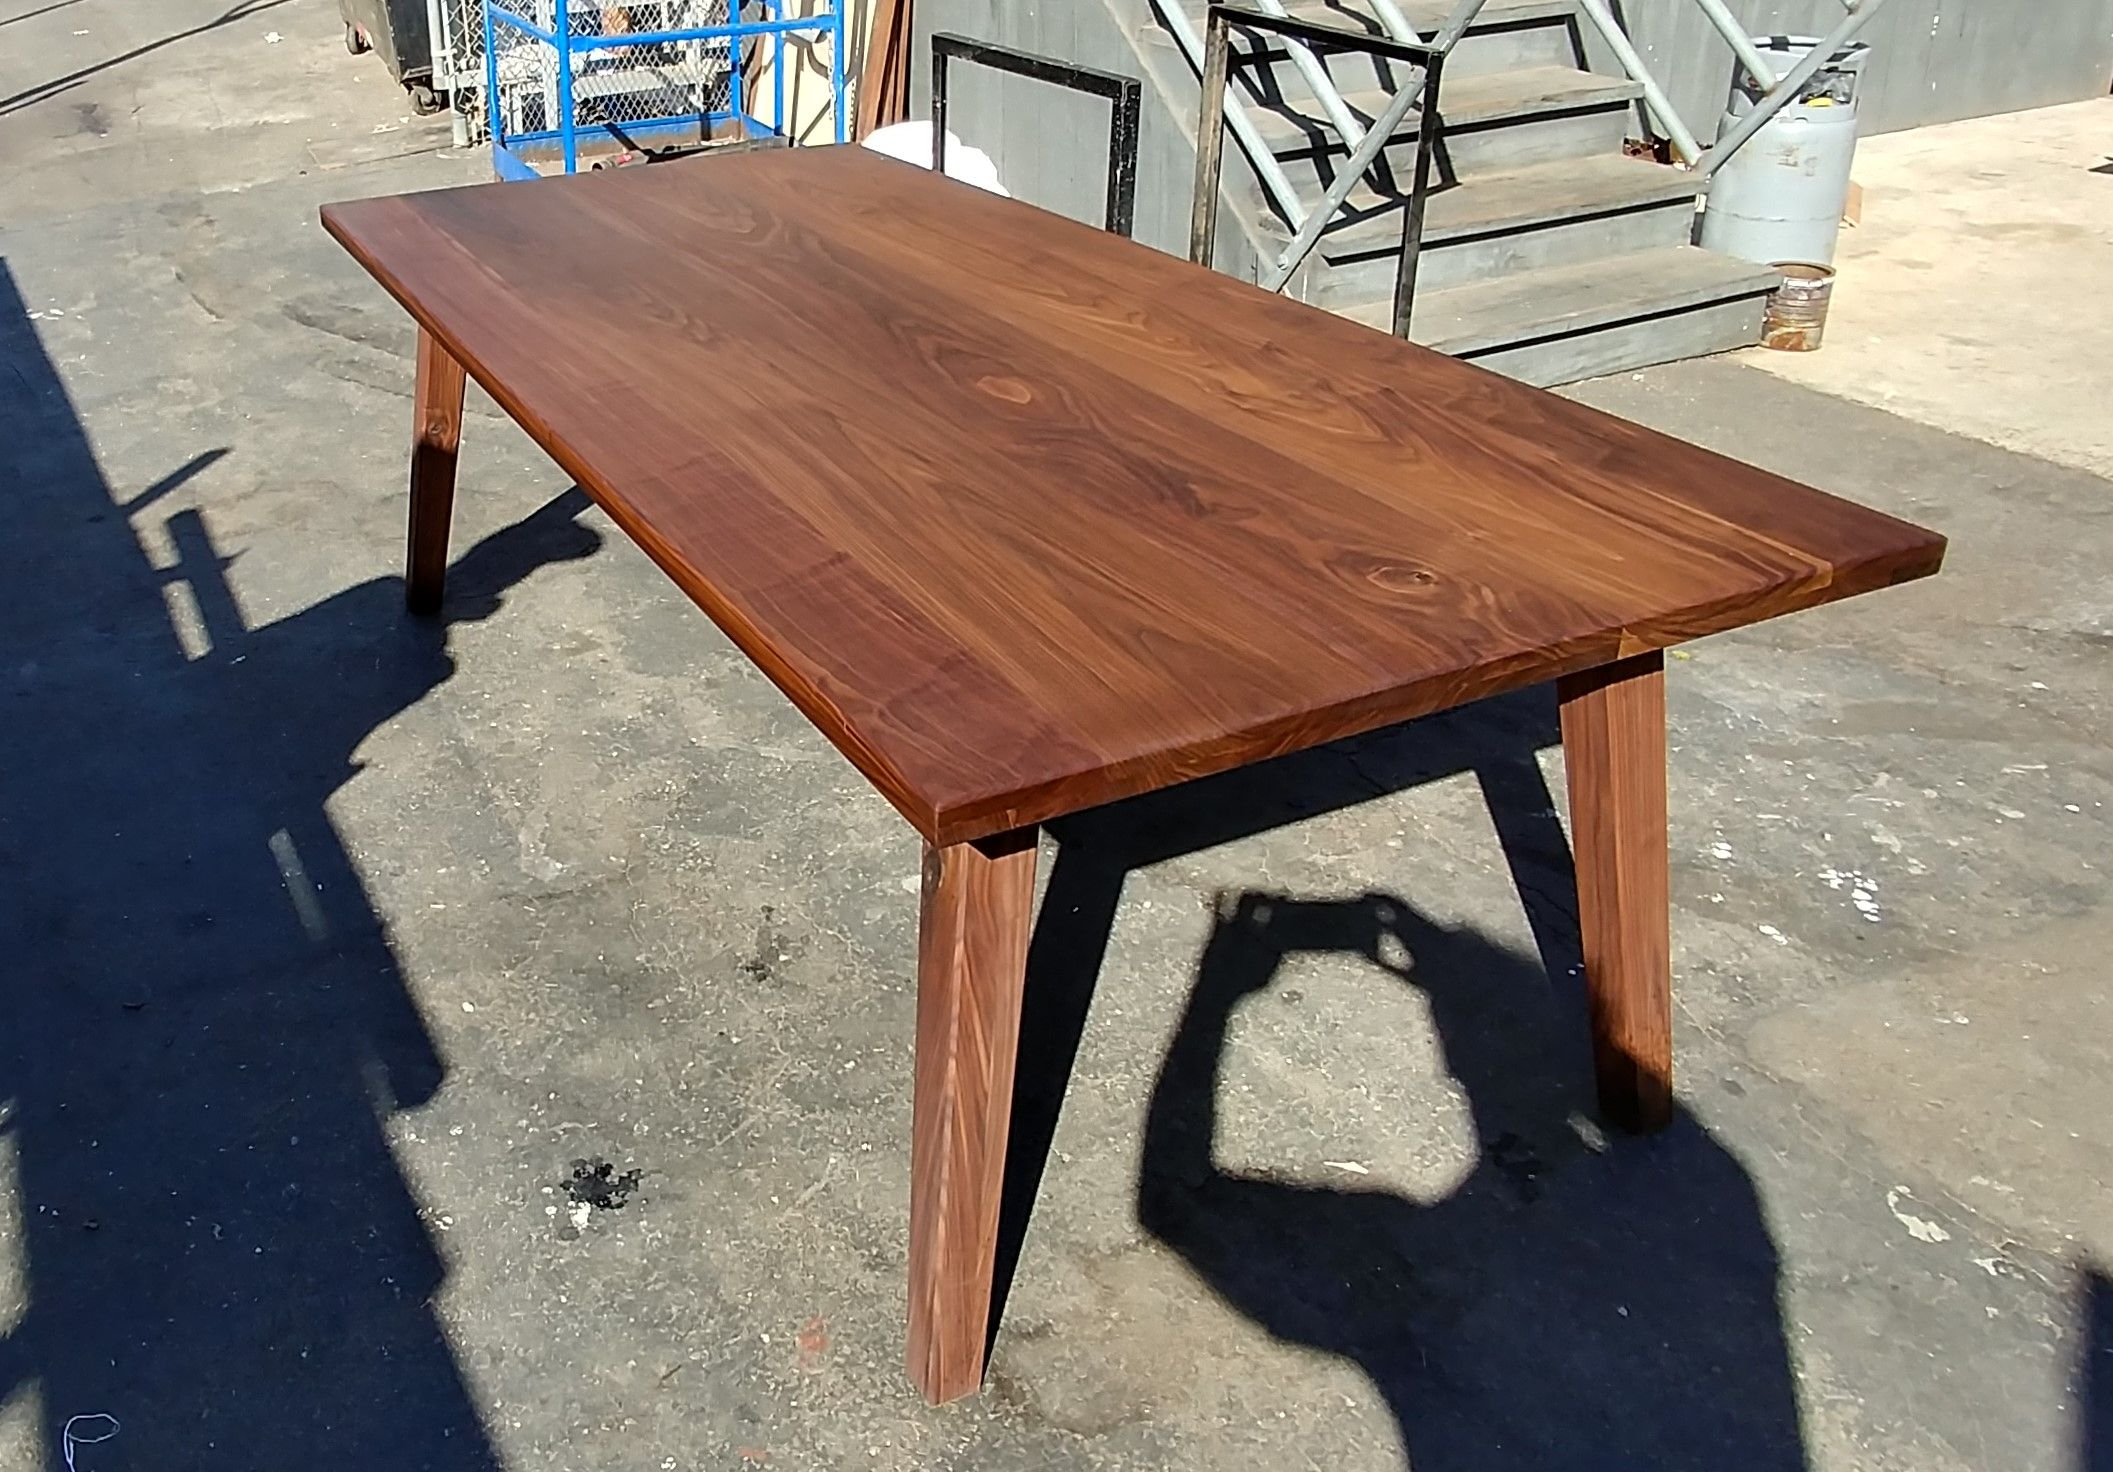 Marvelous Hand Made Massive Solid Walnut Dining Table By Antikea Creativecarmelina Interior Chair Design Creativecarmelinacom